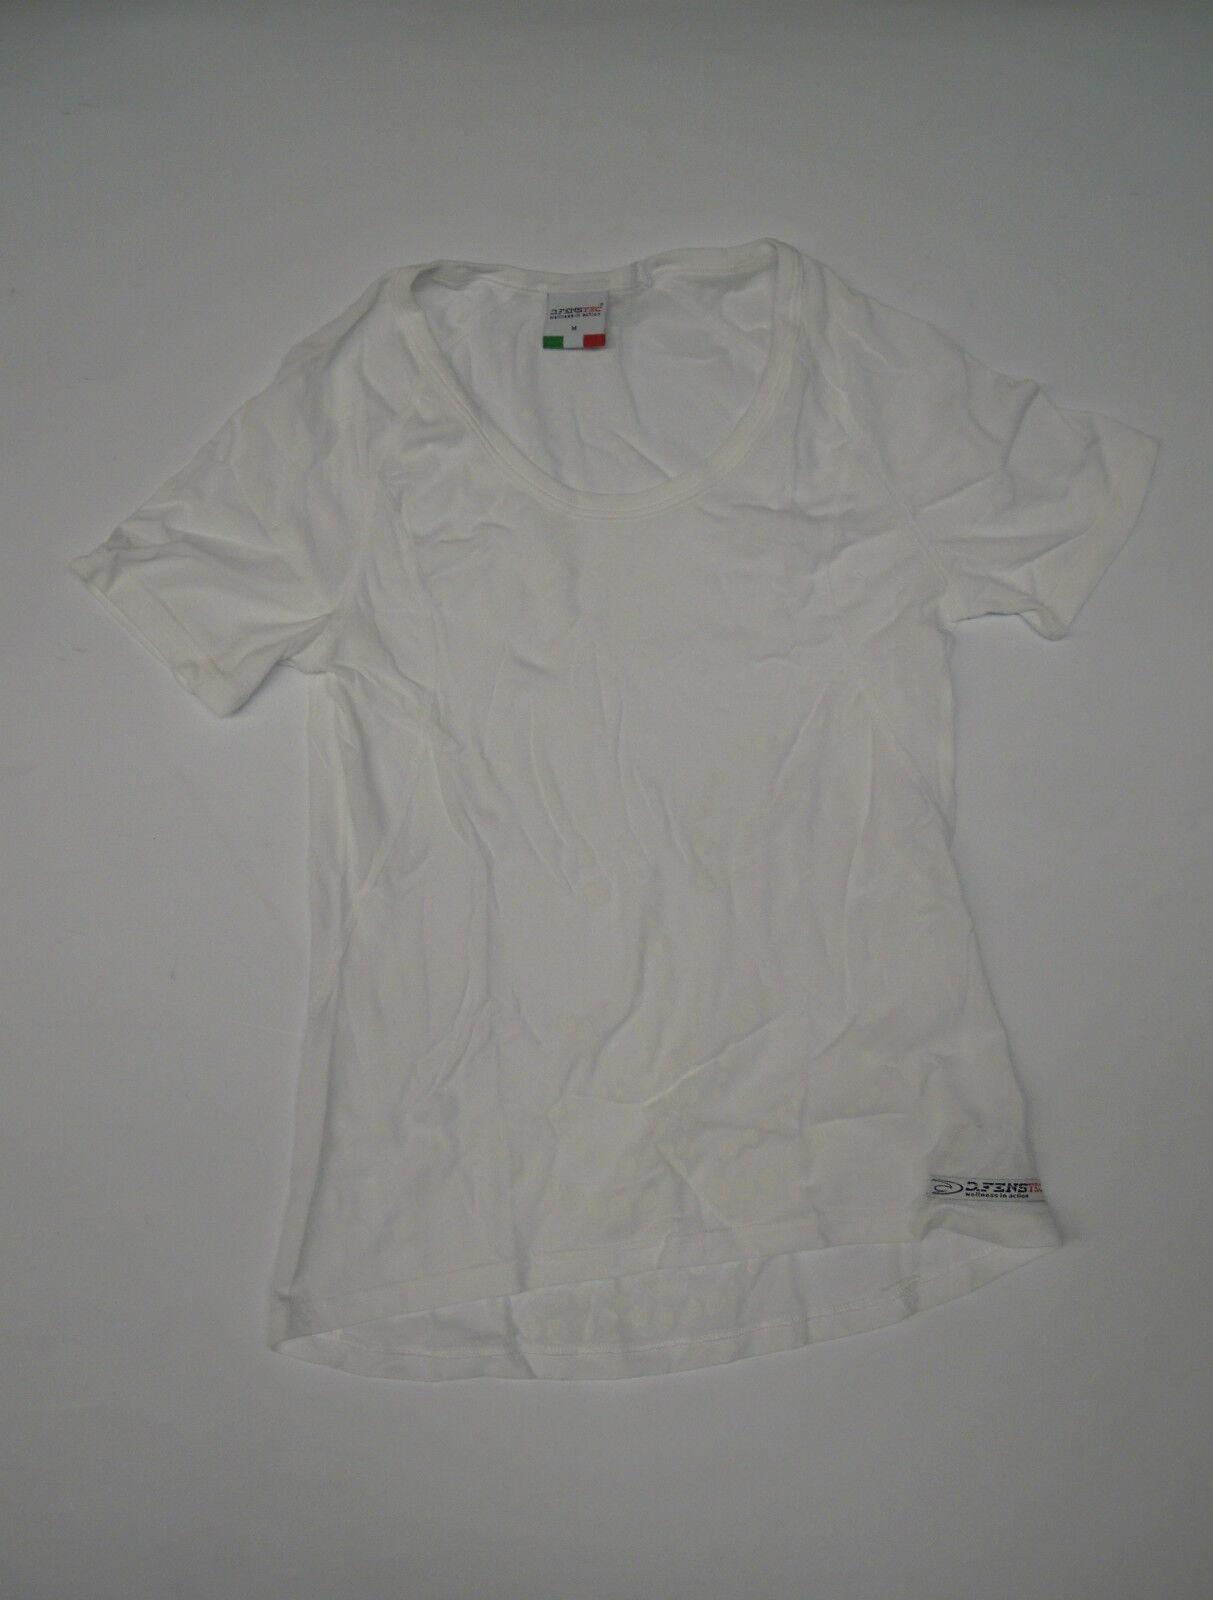 Stability Stability Stability - Light - damen - Technical Underwear - weiß - Größe  M, L, XL 976ad8